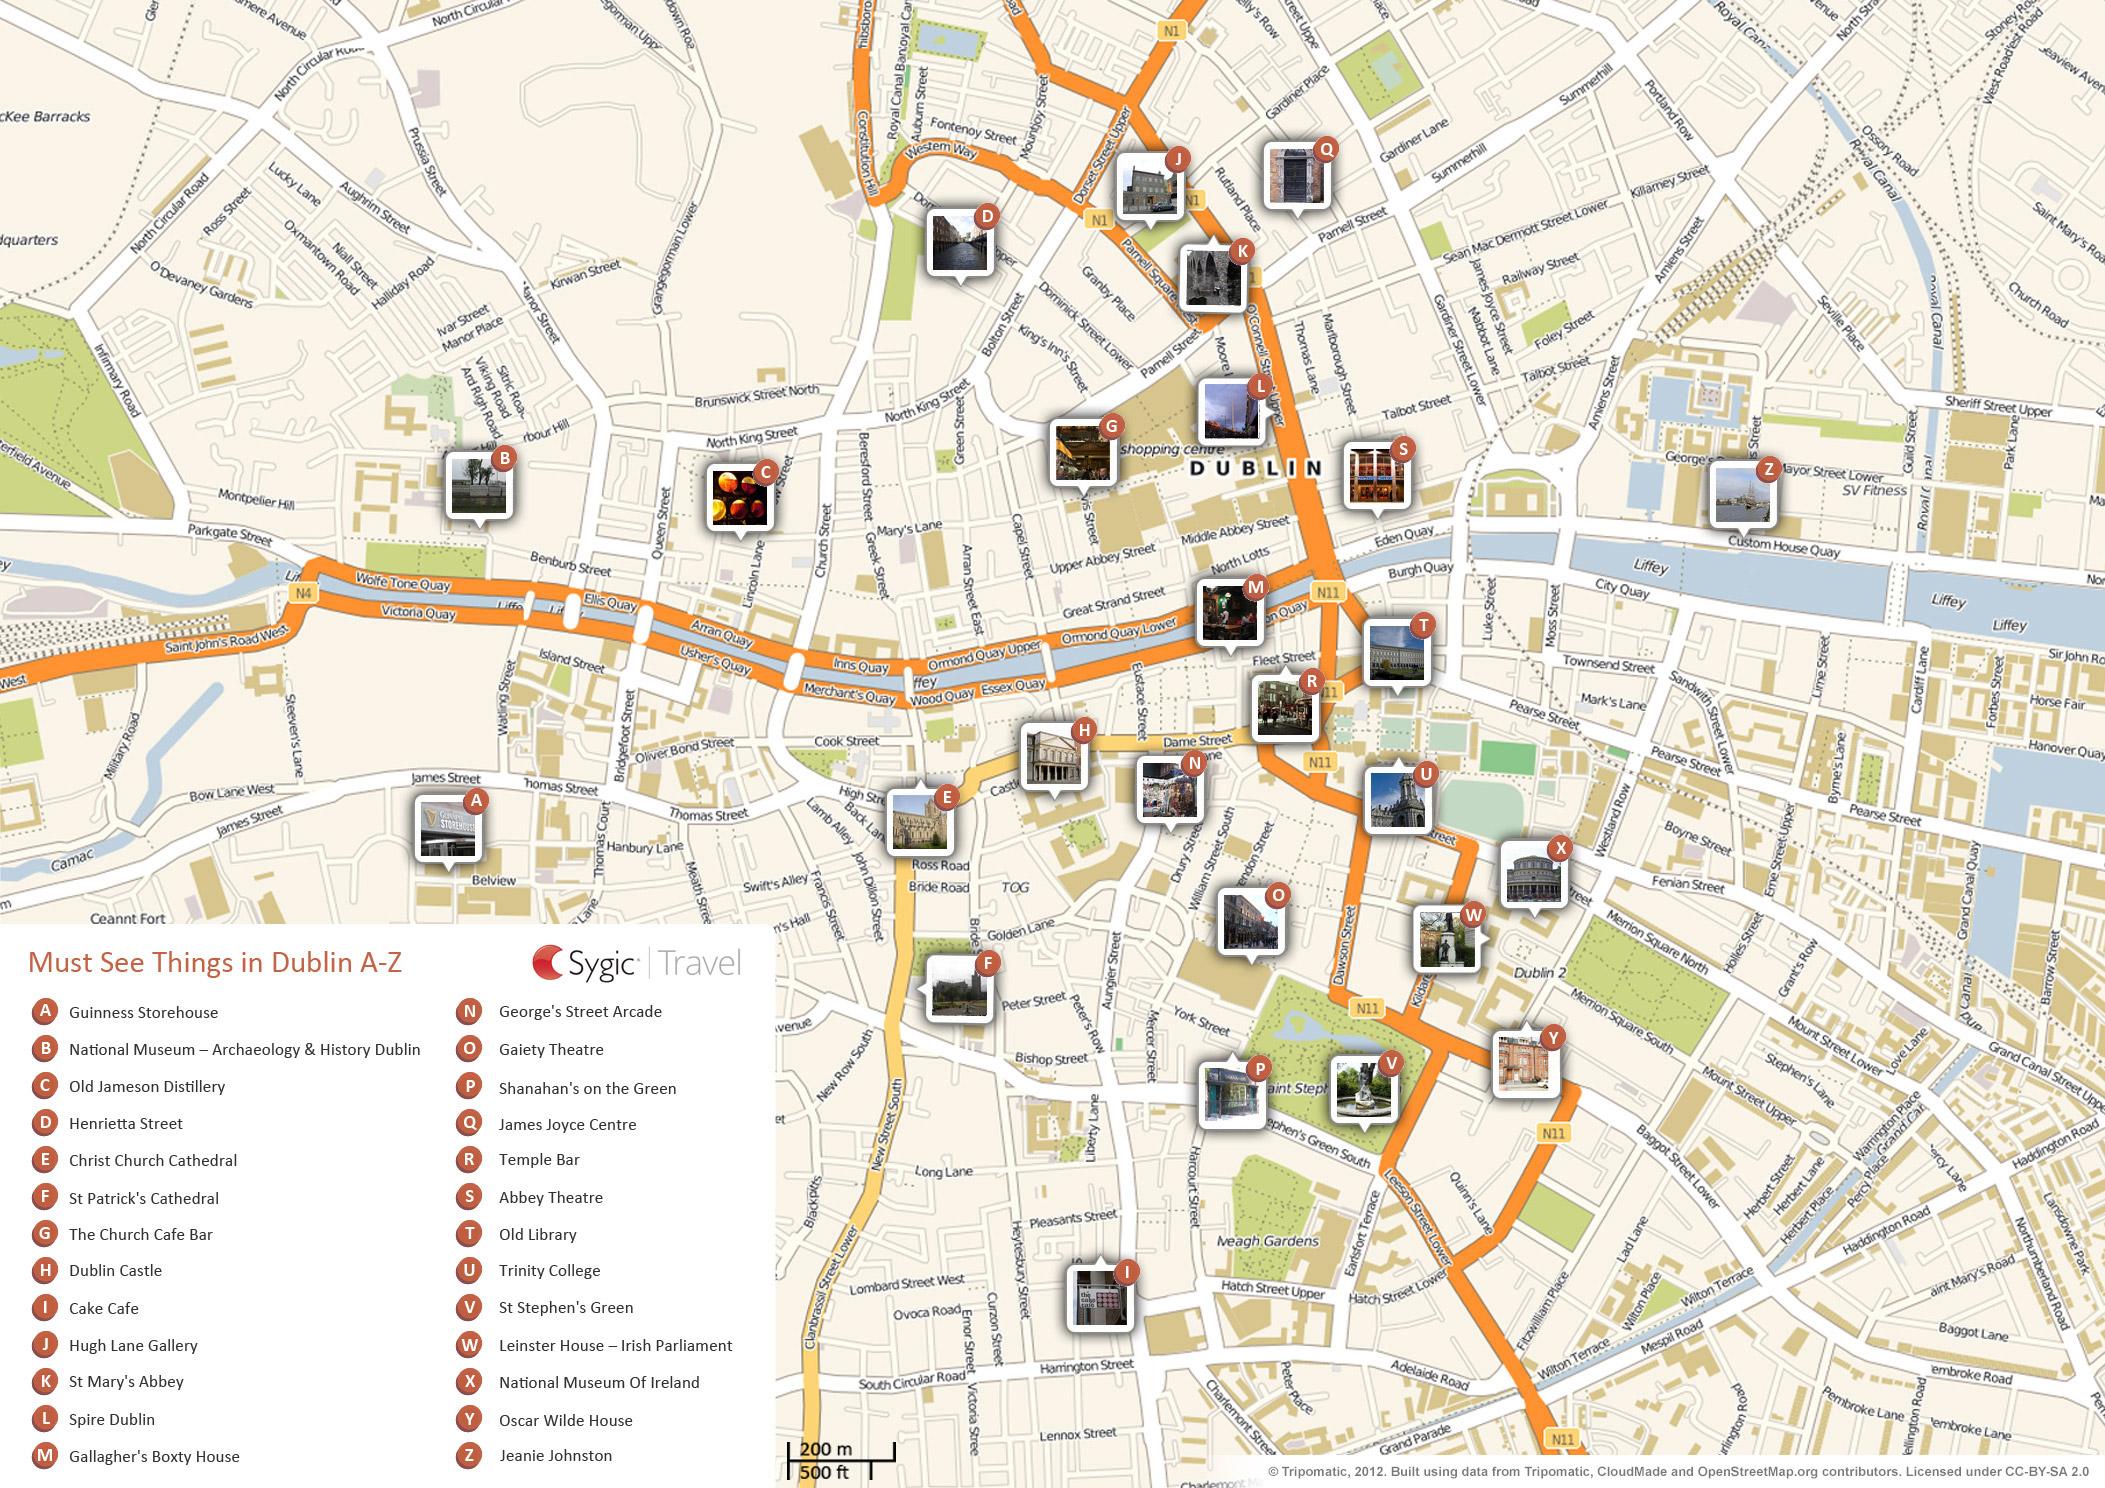 Versatile image intended for printable map of dublin